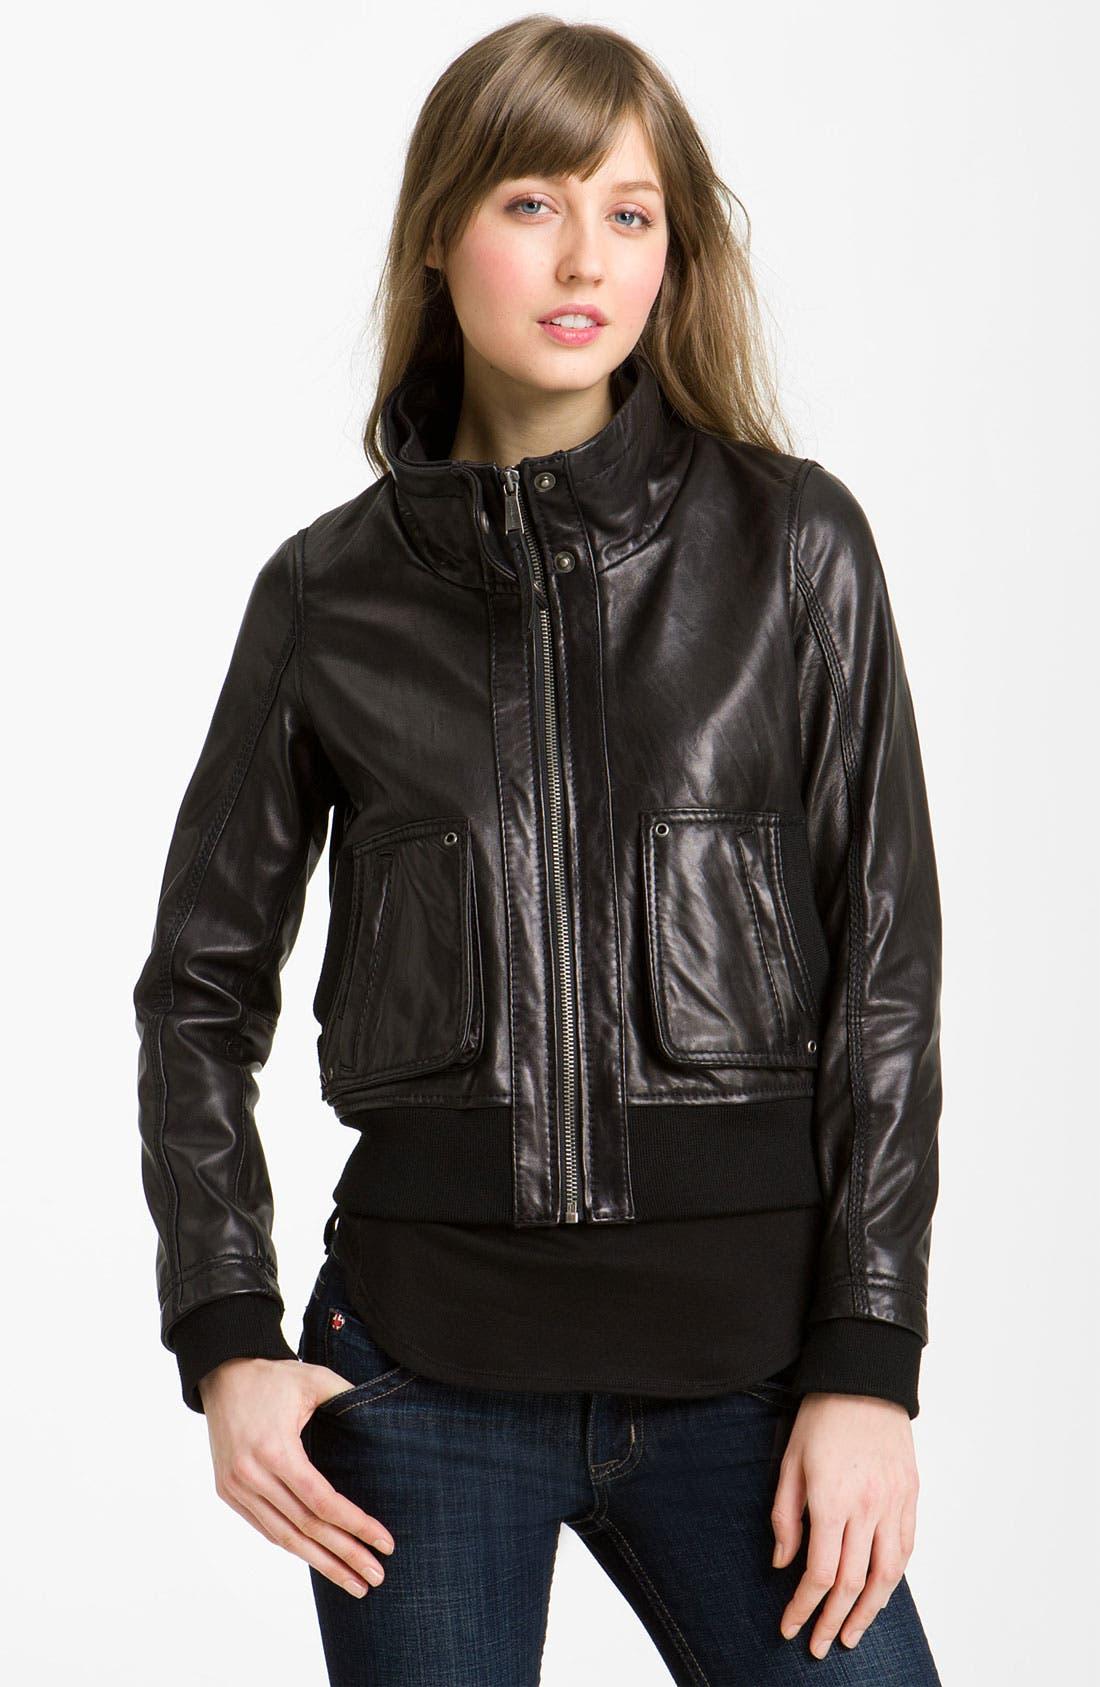 Alternate Image 1 Selected - MICHAEL Michael Kors Knit Trim Leather Bomber Jacket